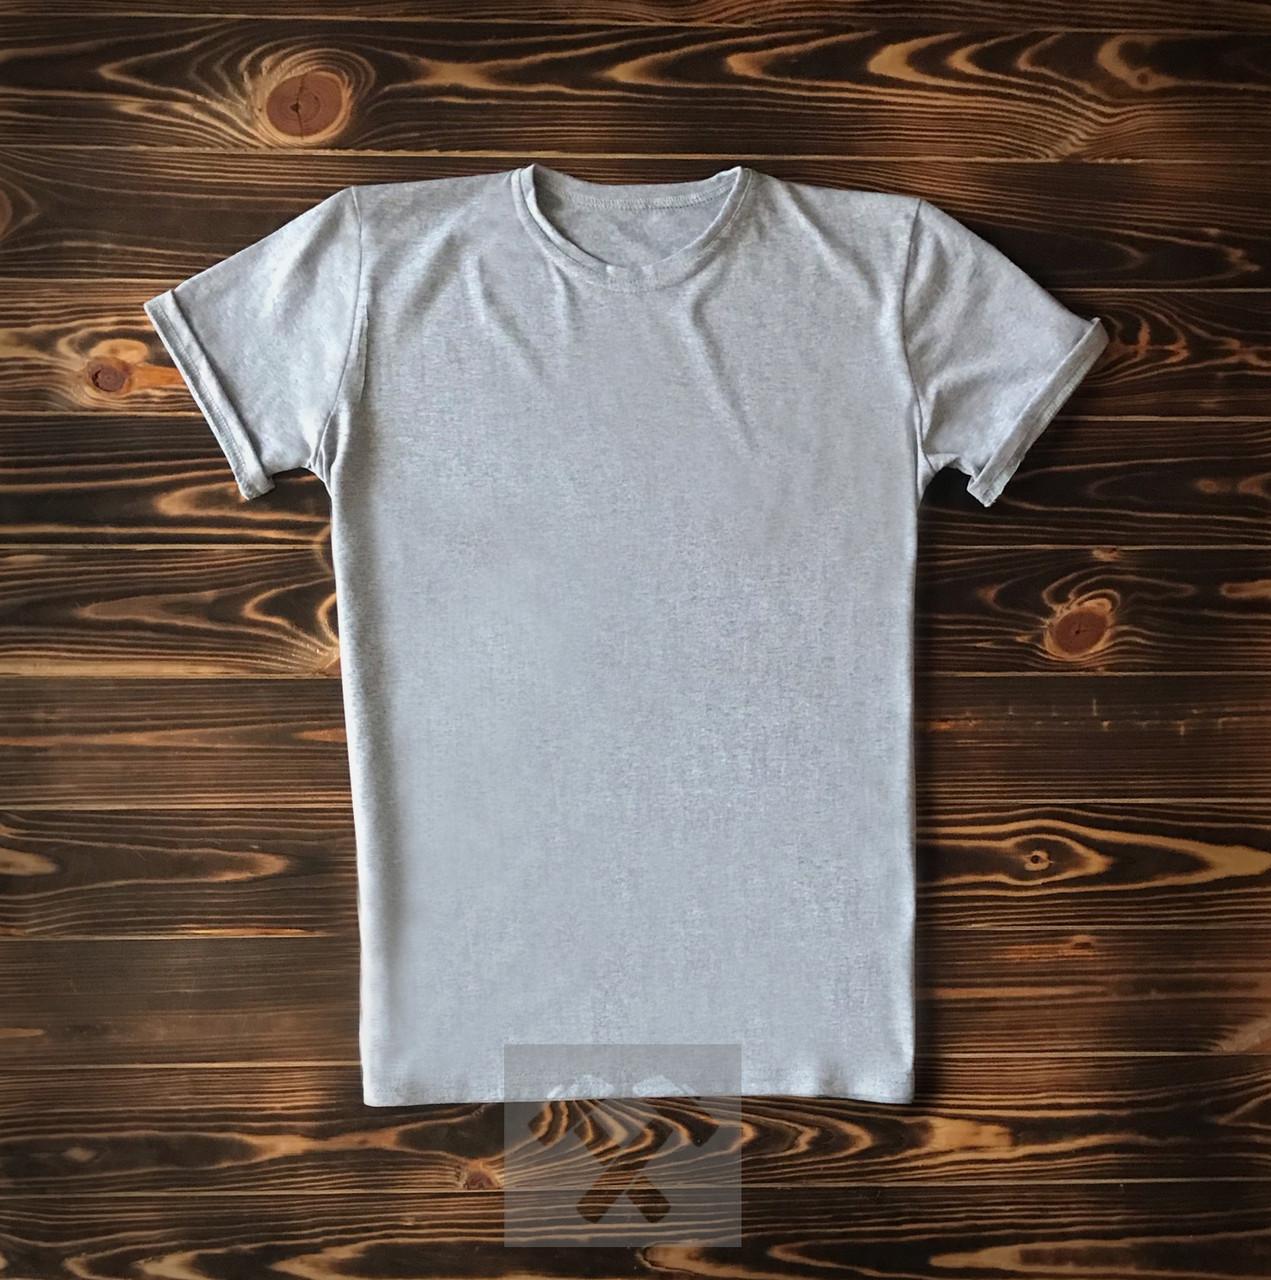 161da8d5e6ad1 Серая мужская футболка , цена 275 грн., купить в Киеве — Prom.ua (ID ...